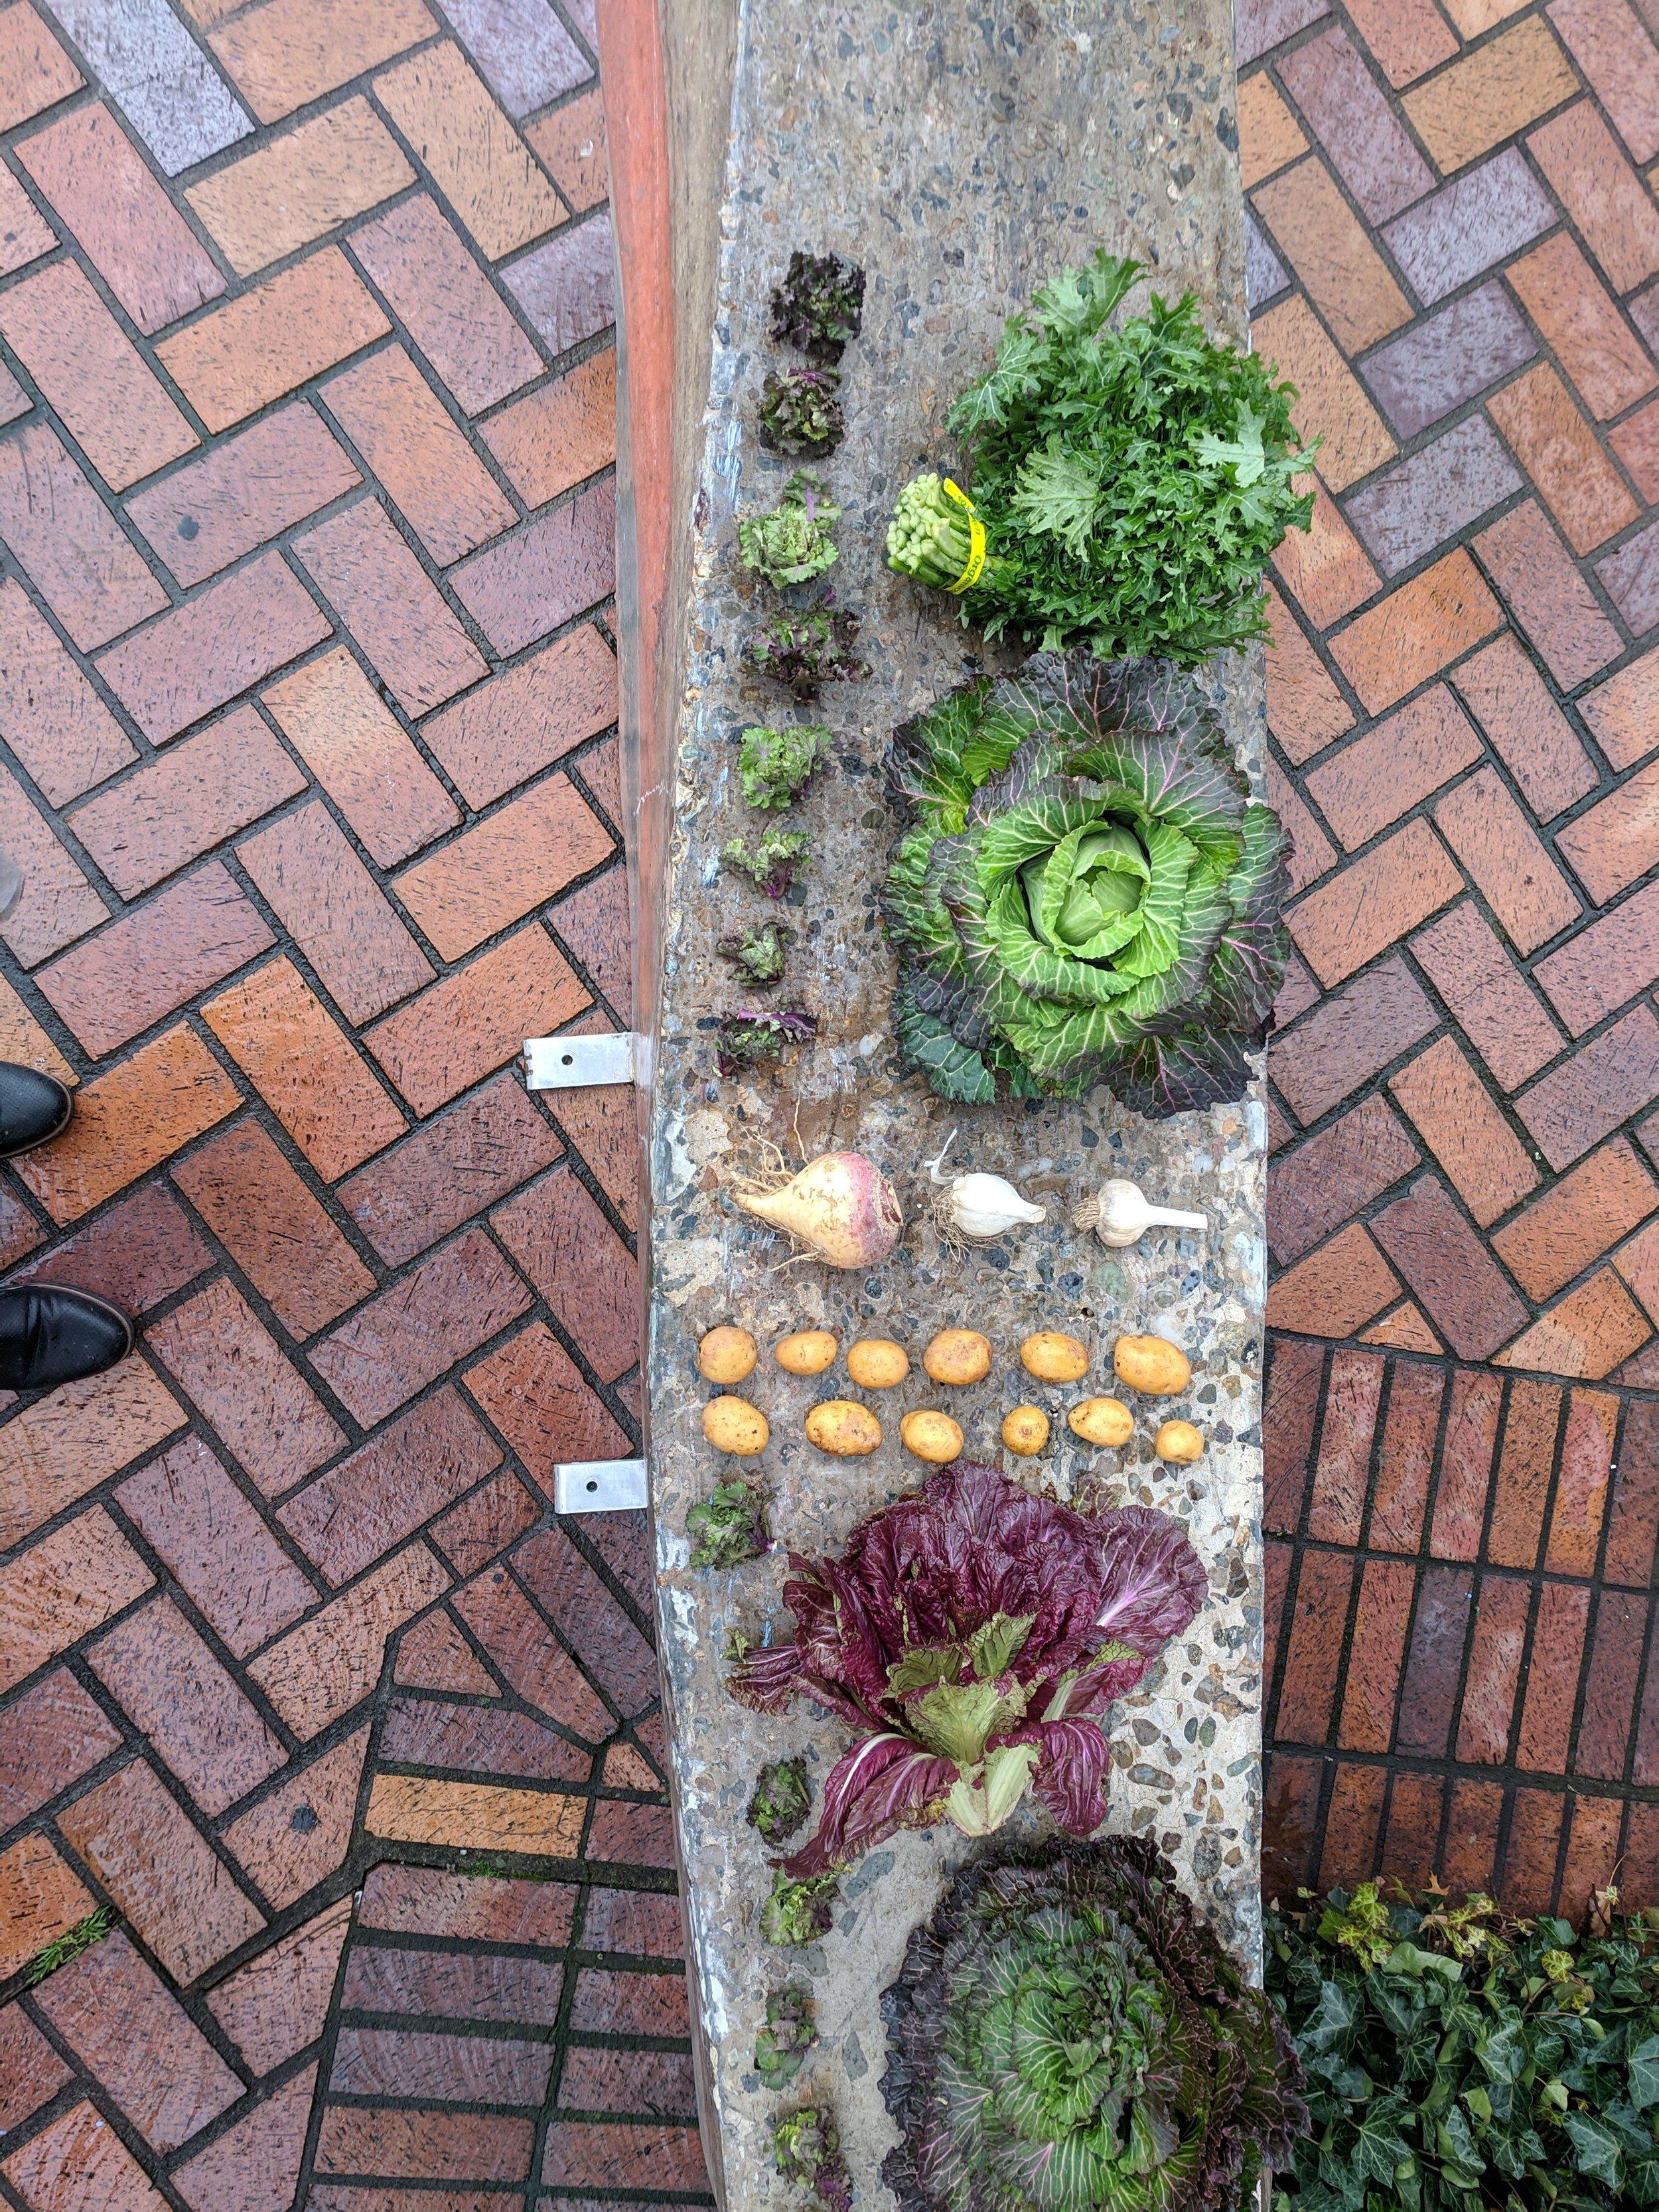 girl meets cabbage, february 16, 2019, circa portland farmers market @ psu